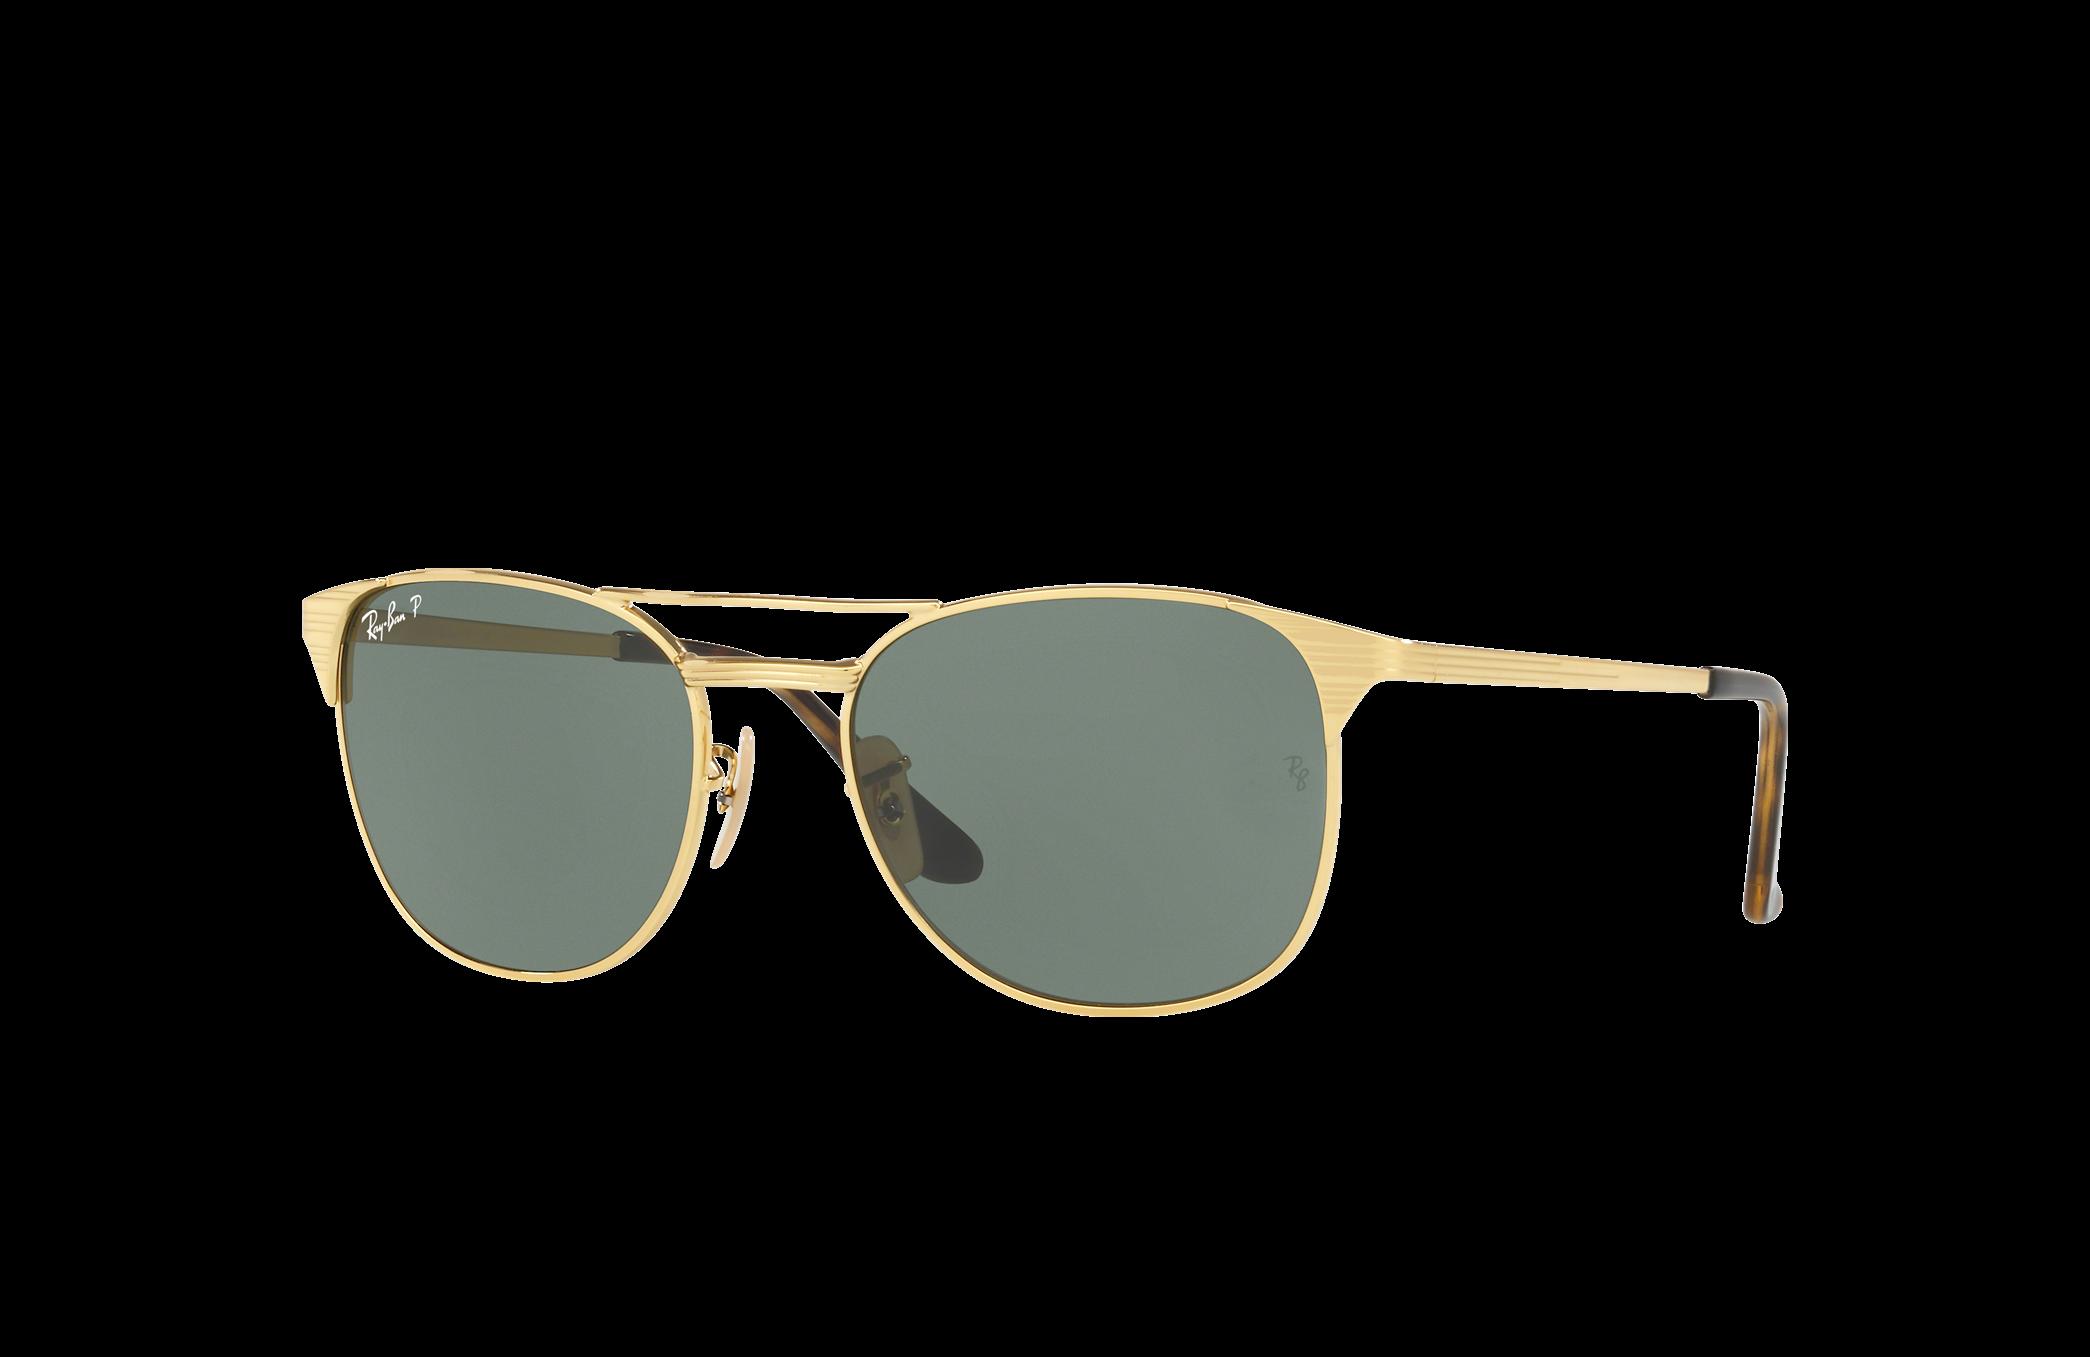 Ray-Ban Signet Gold, Polarized Green Lenses - RB3429M